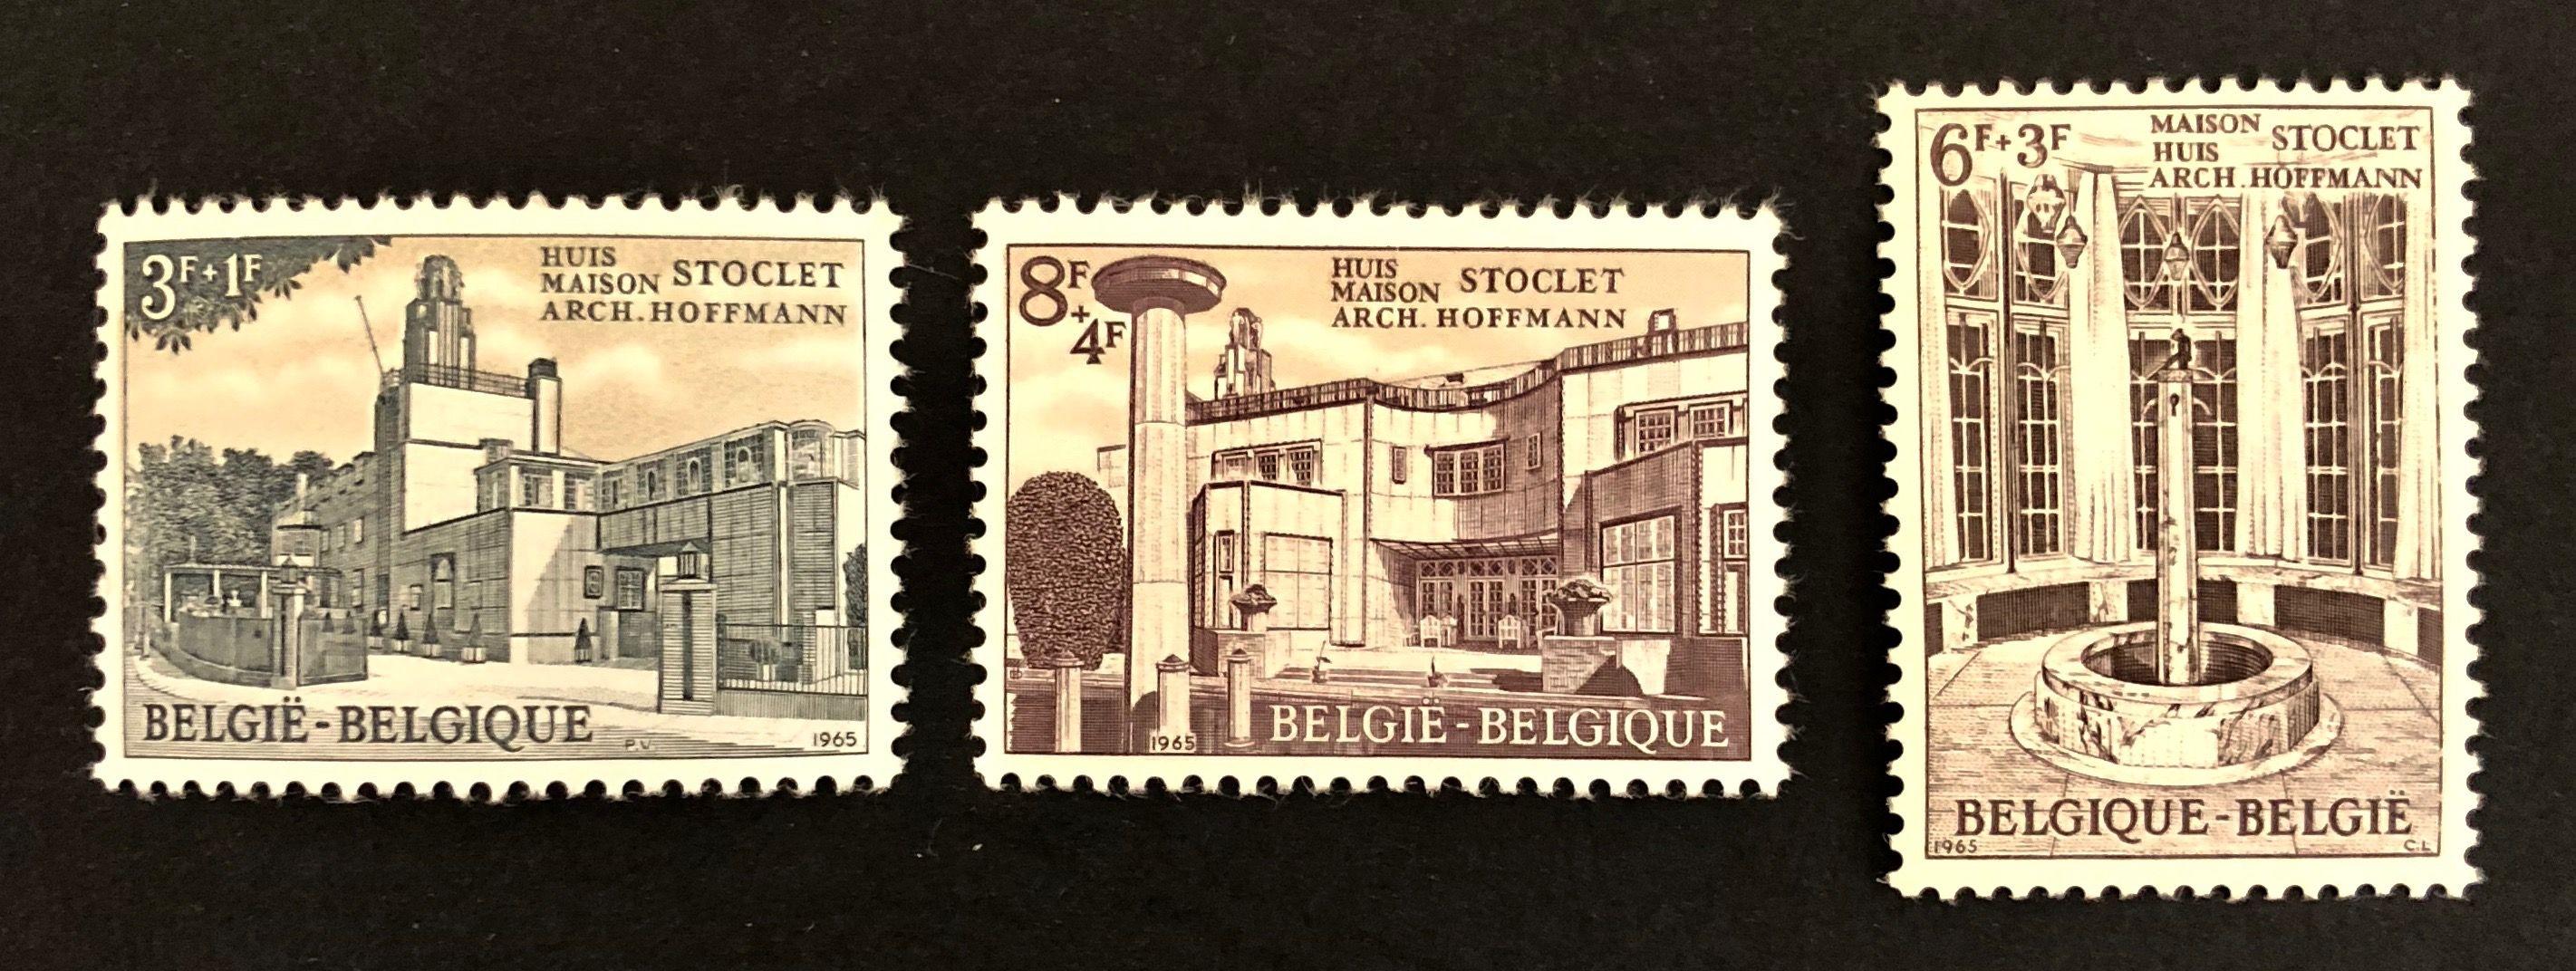 UNESCO WorldHeritage Stamps Belgium 🇧🇪 Stoclet House